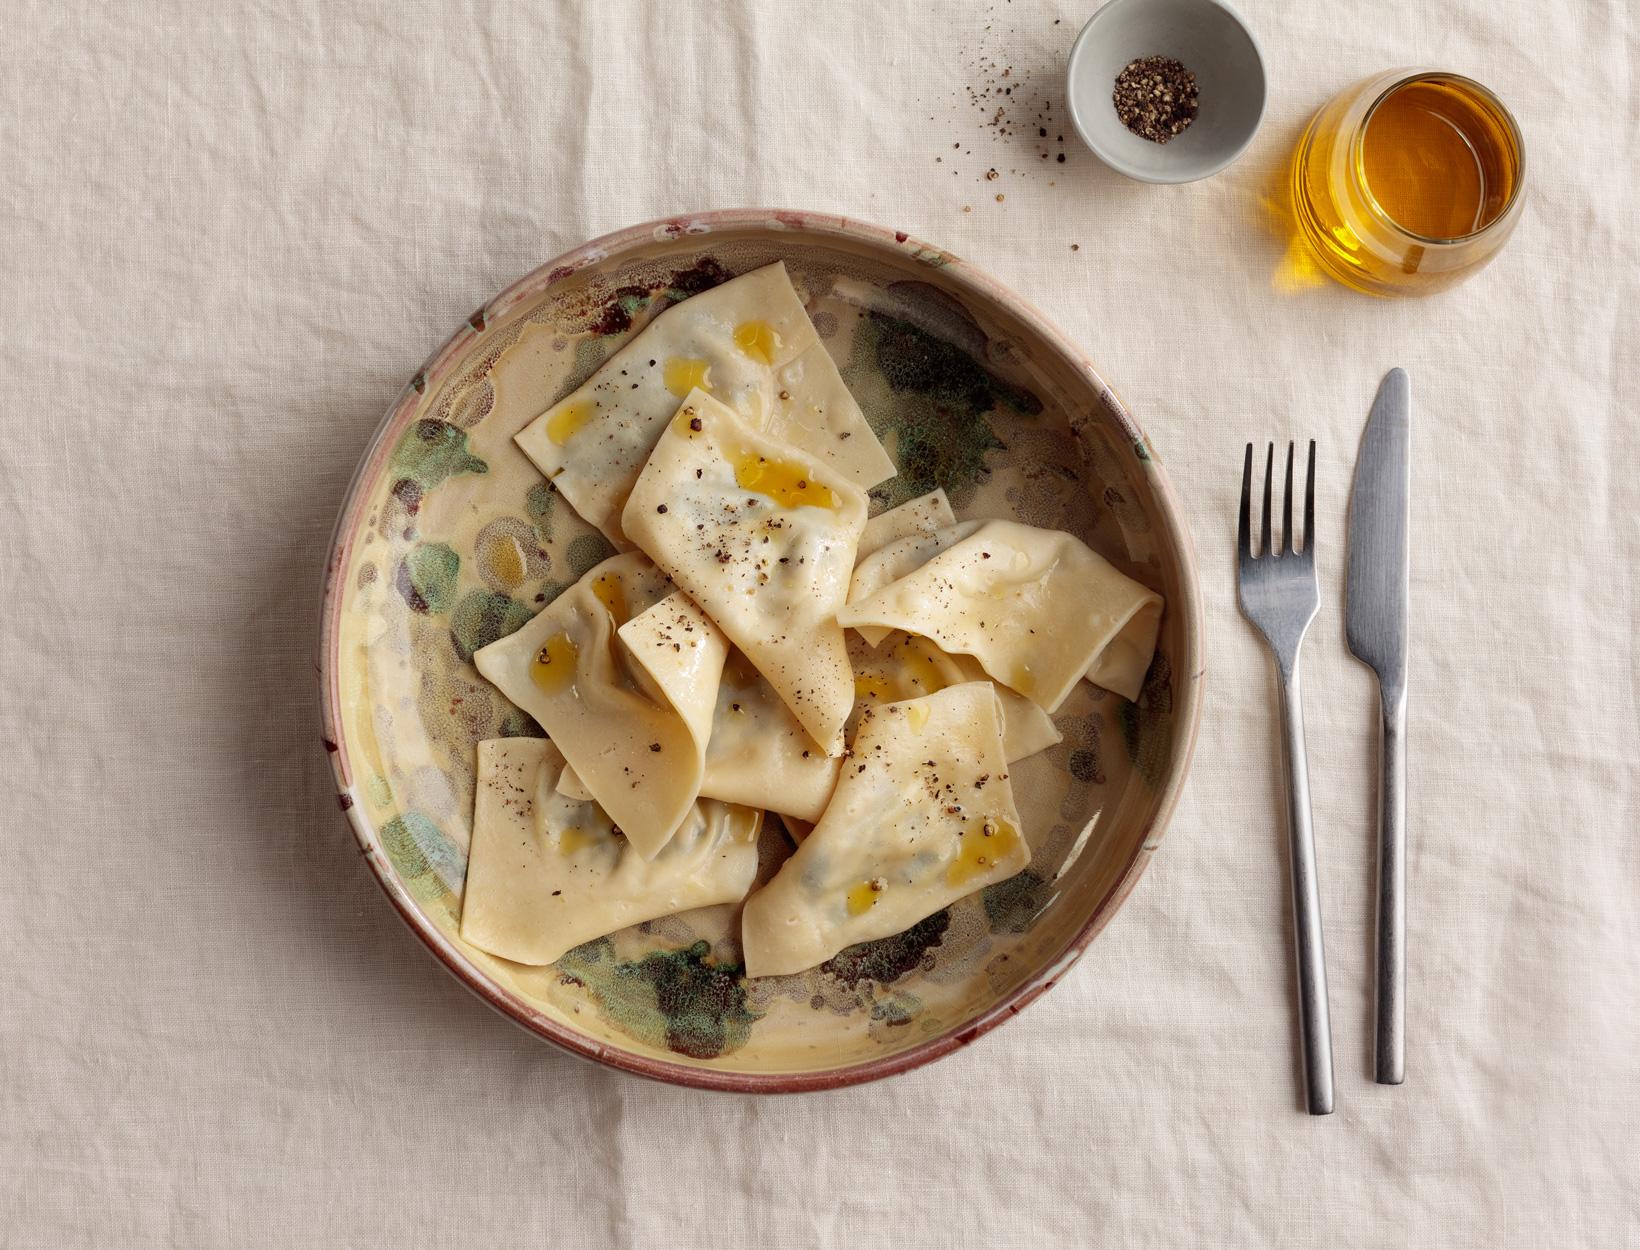 Mushroom, Greens, and Goat Cheese Ravioli